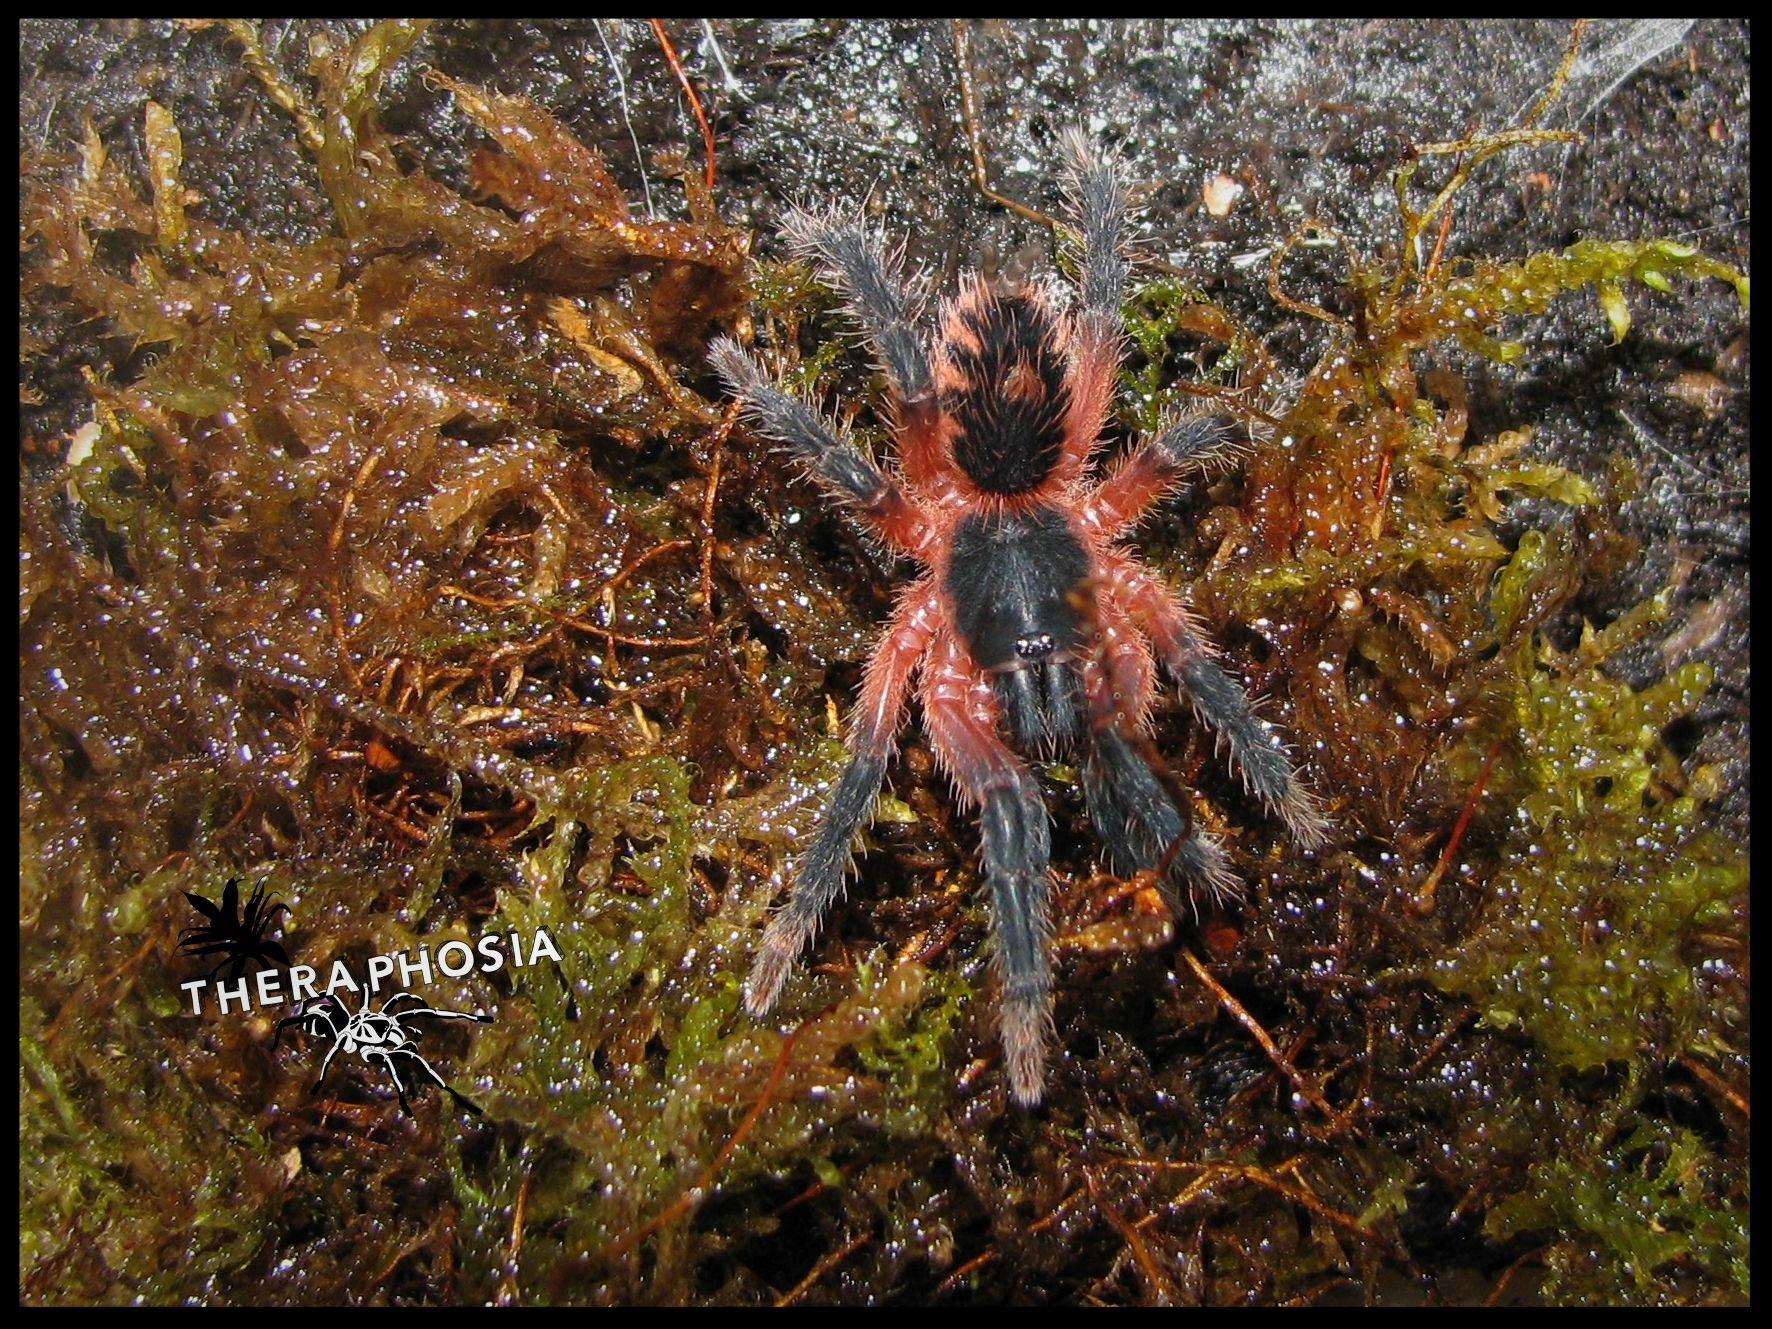 0.1 Theraphosinae sp. Panama